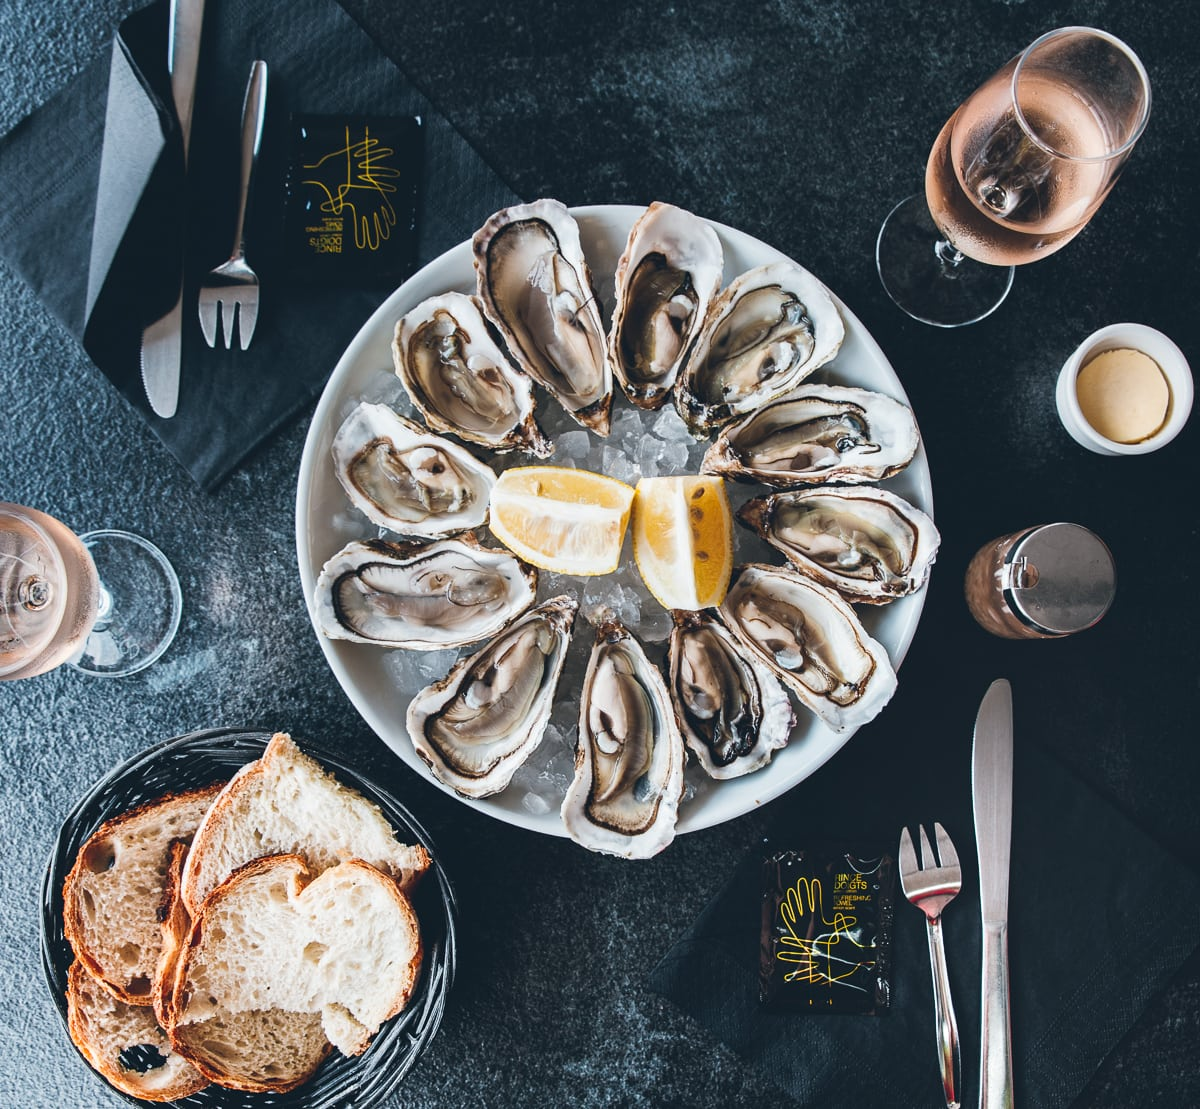 L'Atelier de L'Huitre Oysters in France